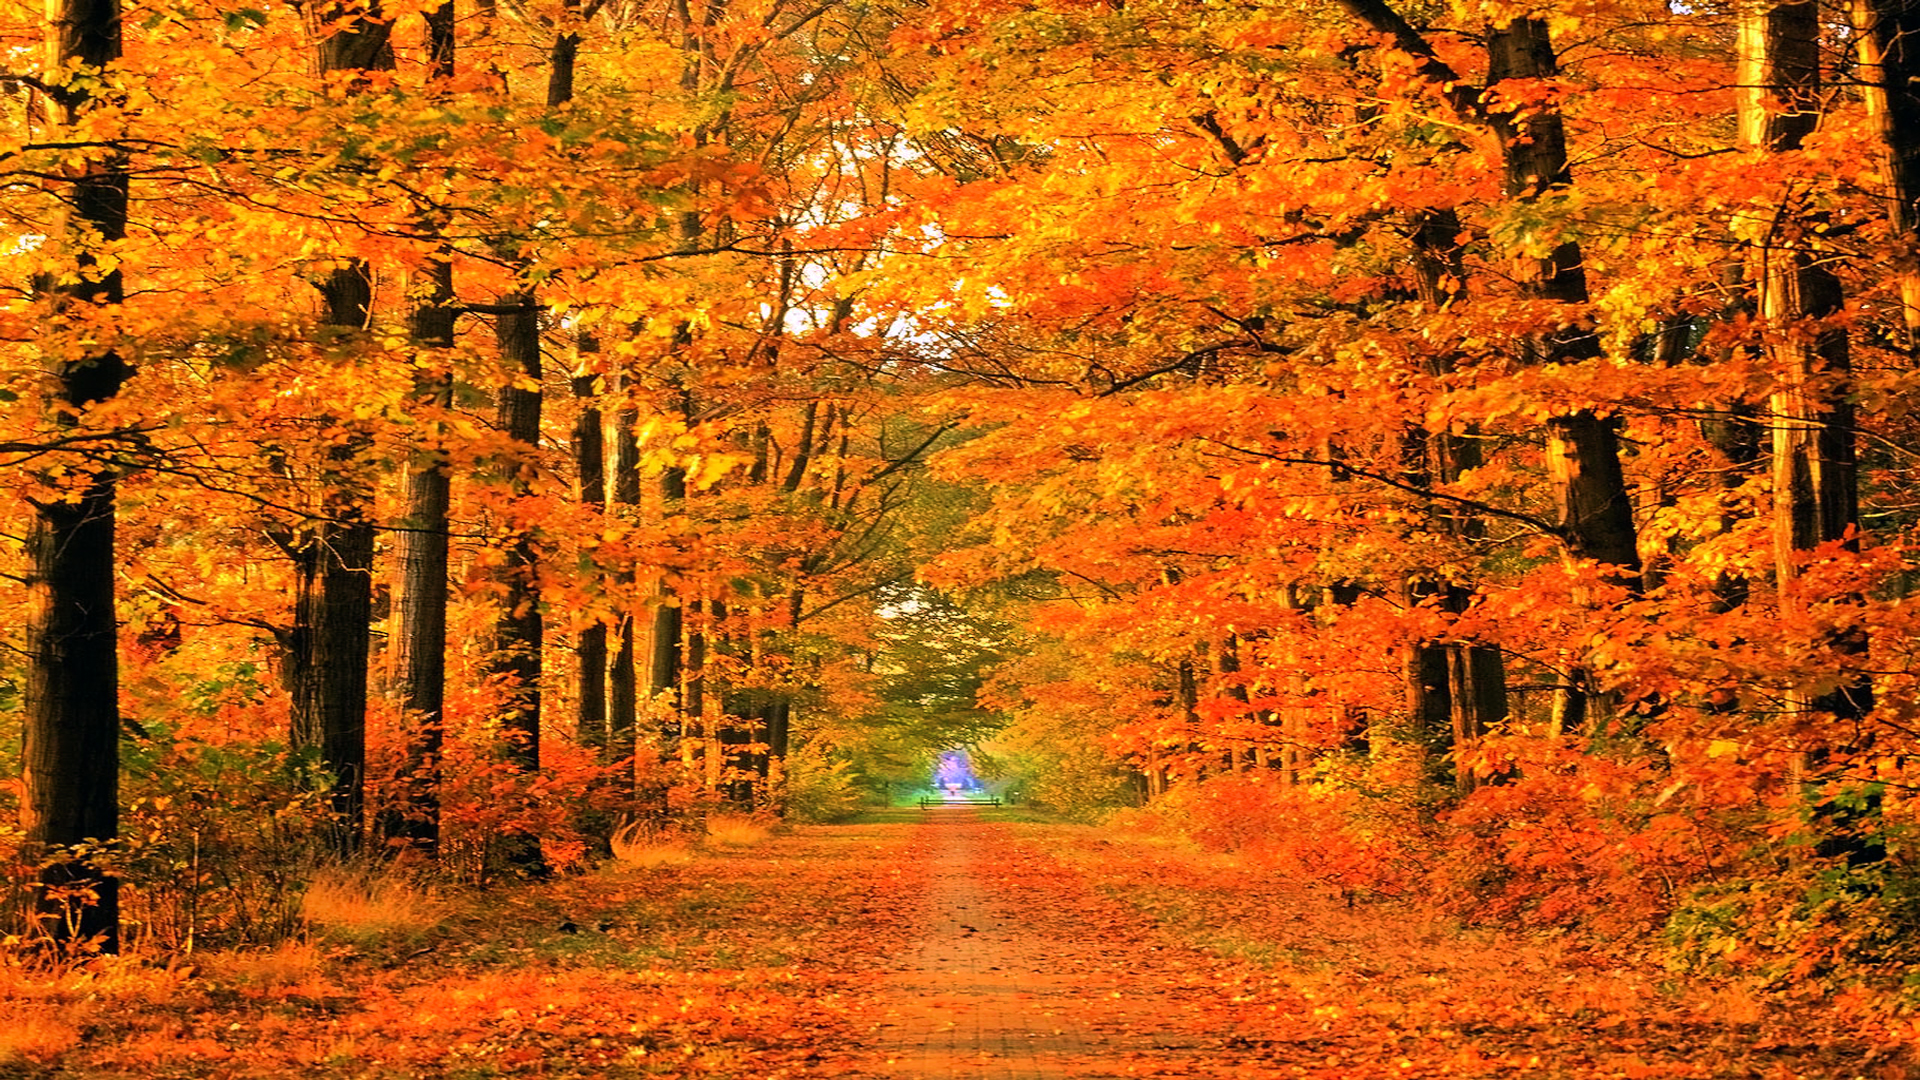 Autumn Roads Wallpaper 1920x1080 Autumn Roads Parks 1920x1080